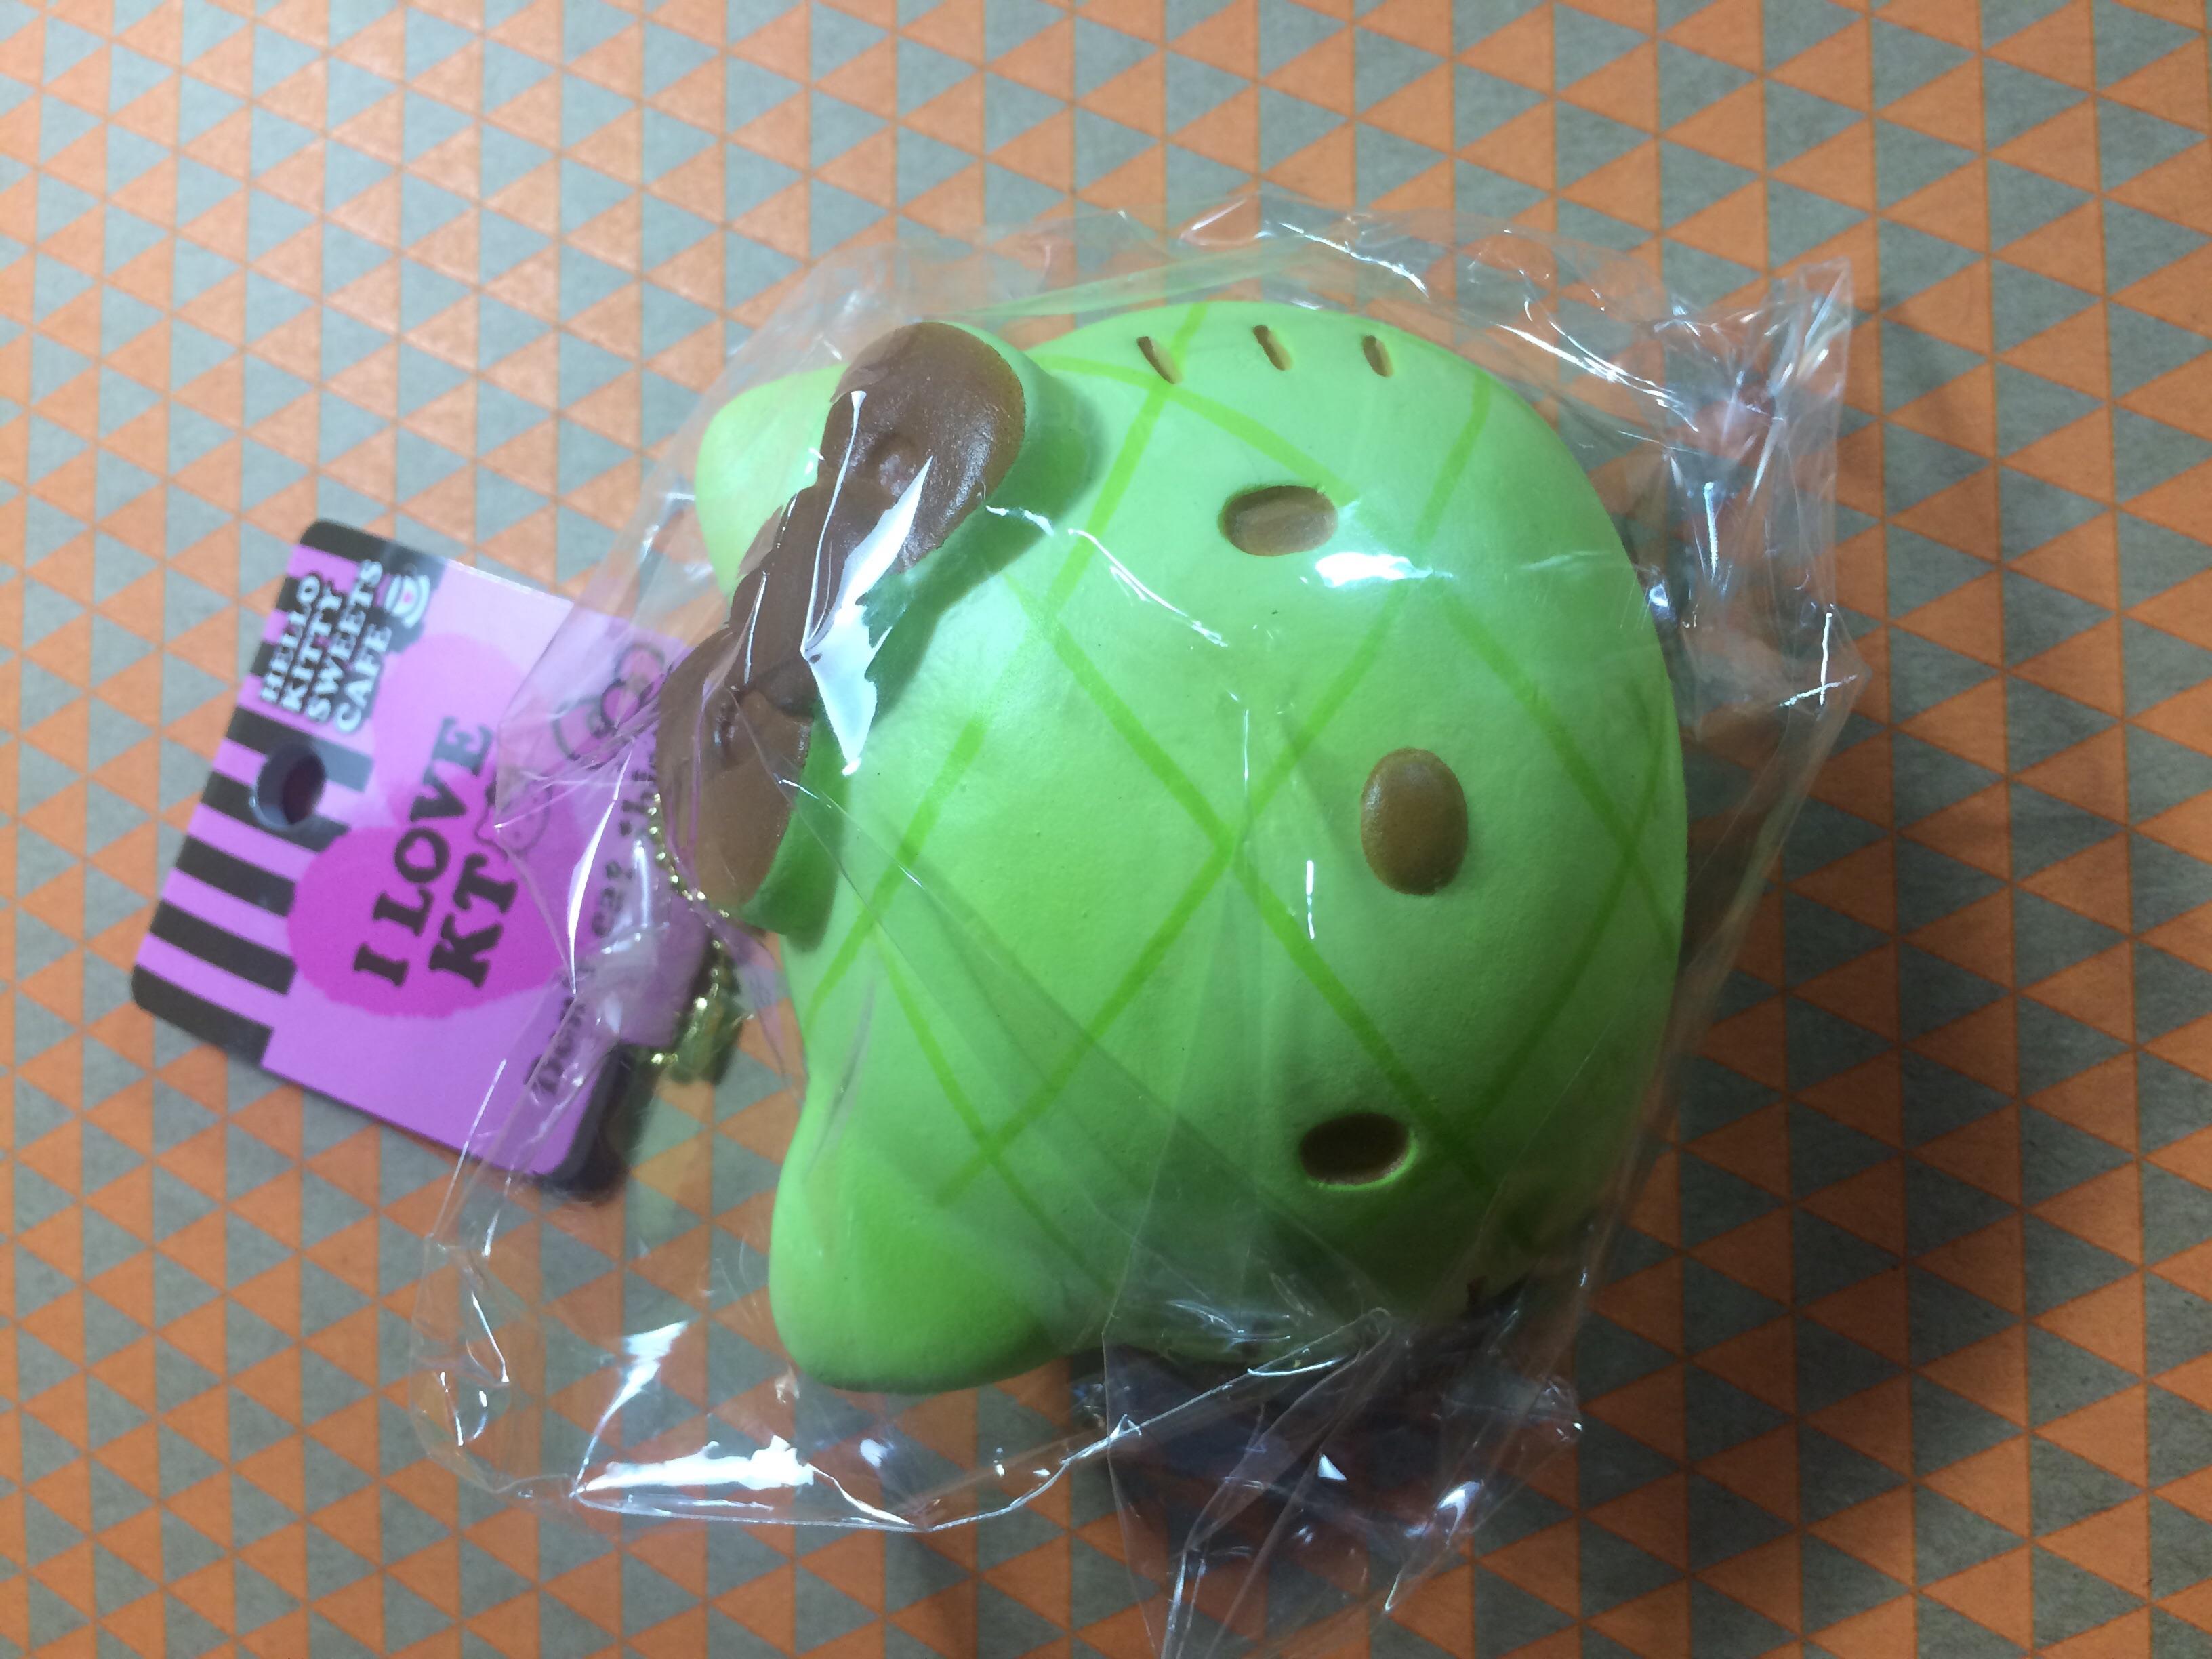 Squishy Head Bun : Hello Kitty Head Bun Squishy ? Squishy Garden ? Online Store Powered by Storenvy